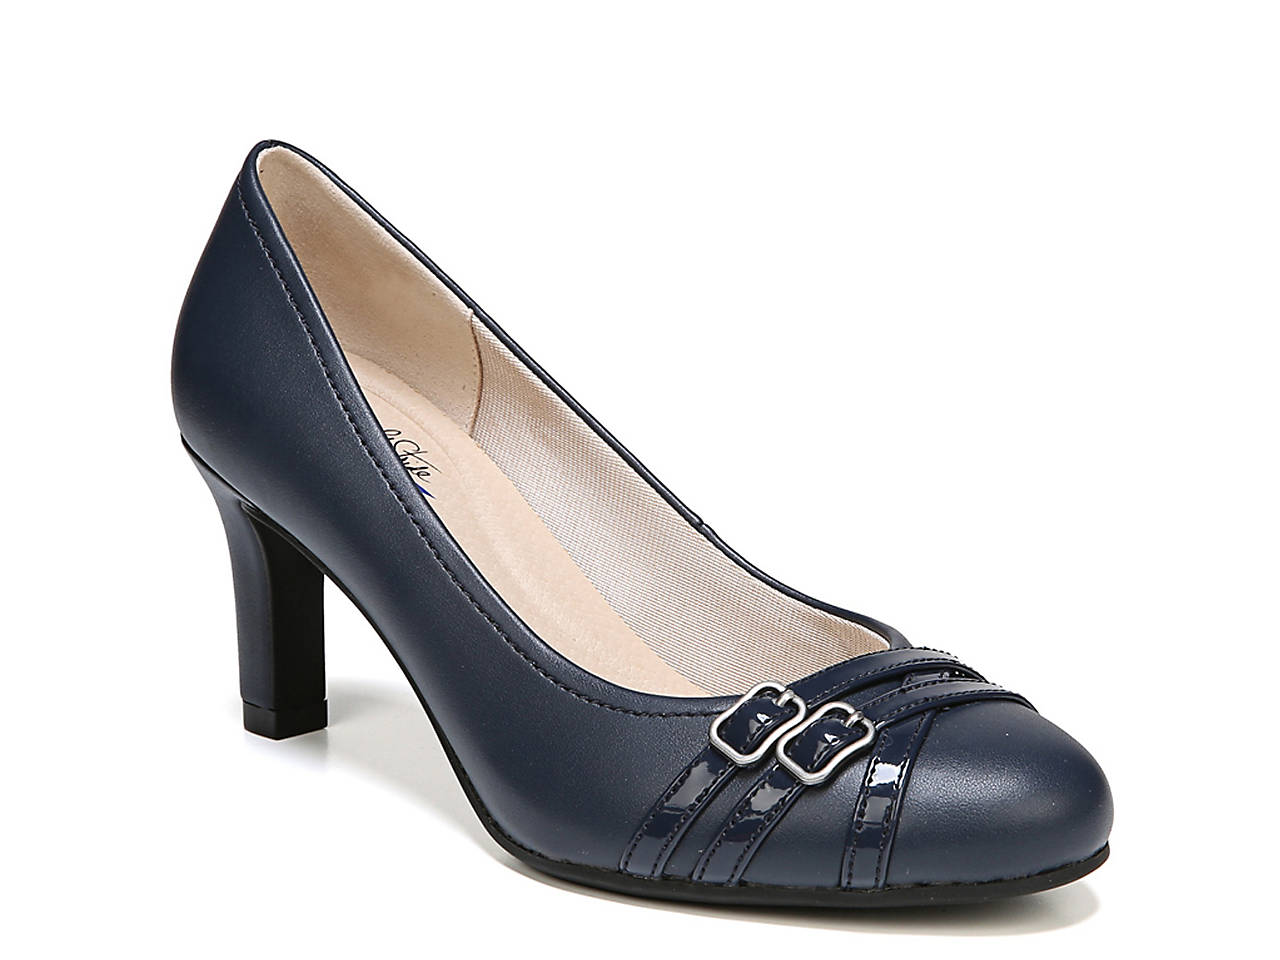 b565c9f135e3 LifeStride Mickie Pump Women s Shoes